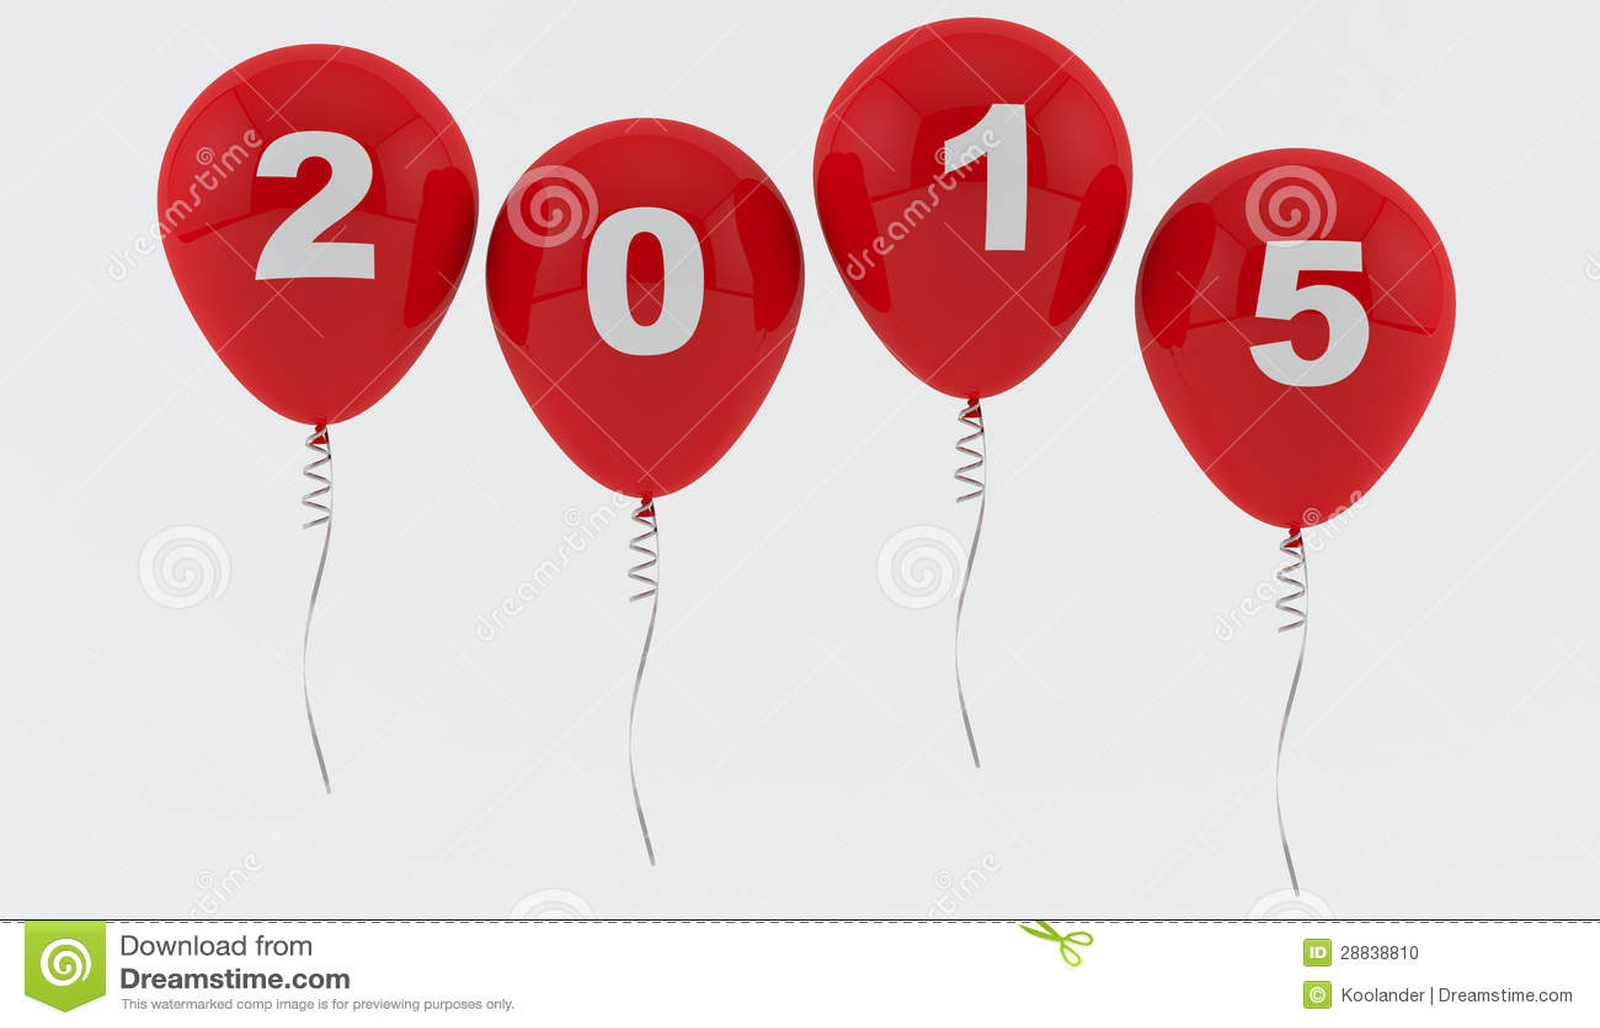 new years balloons clip art - photo #27